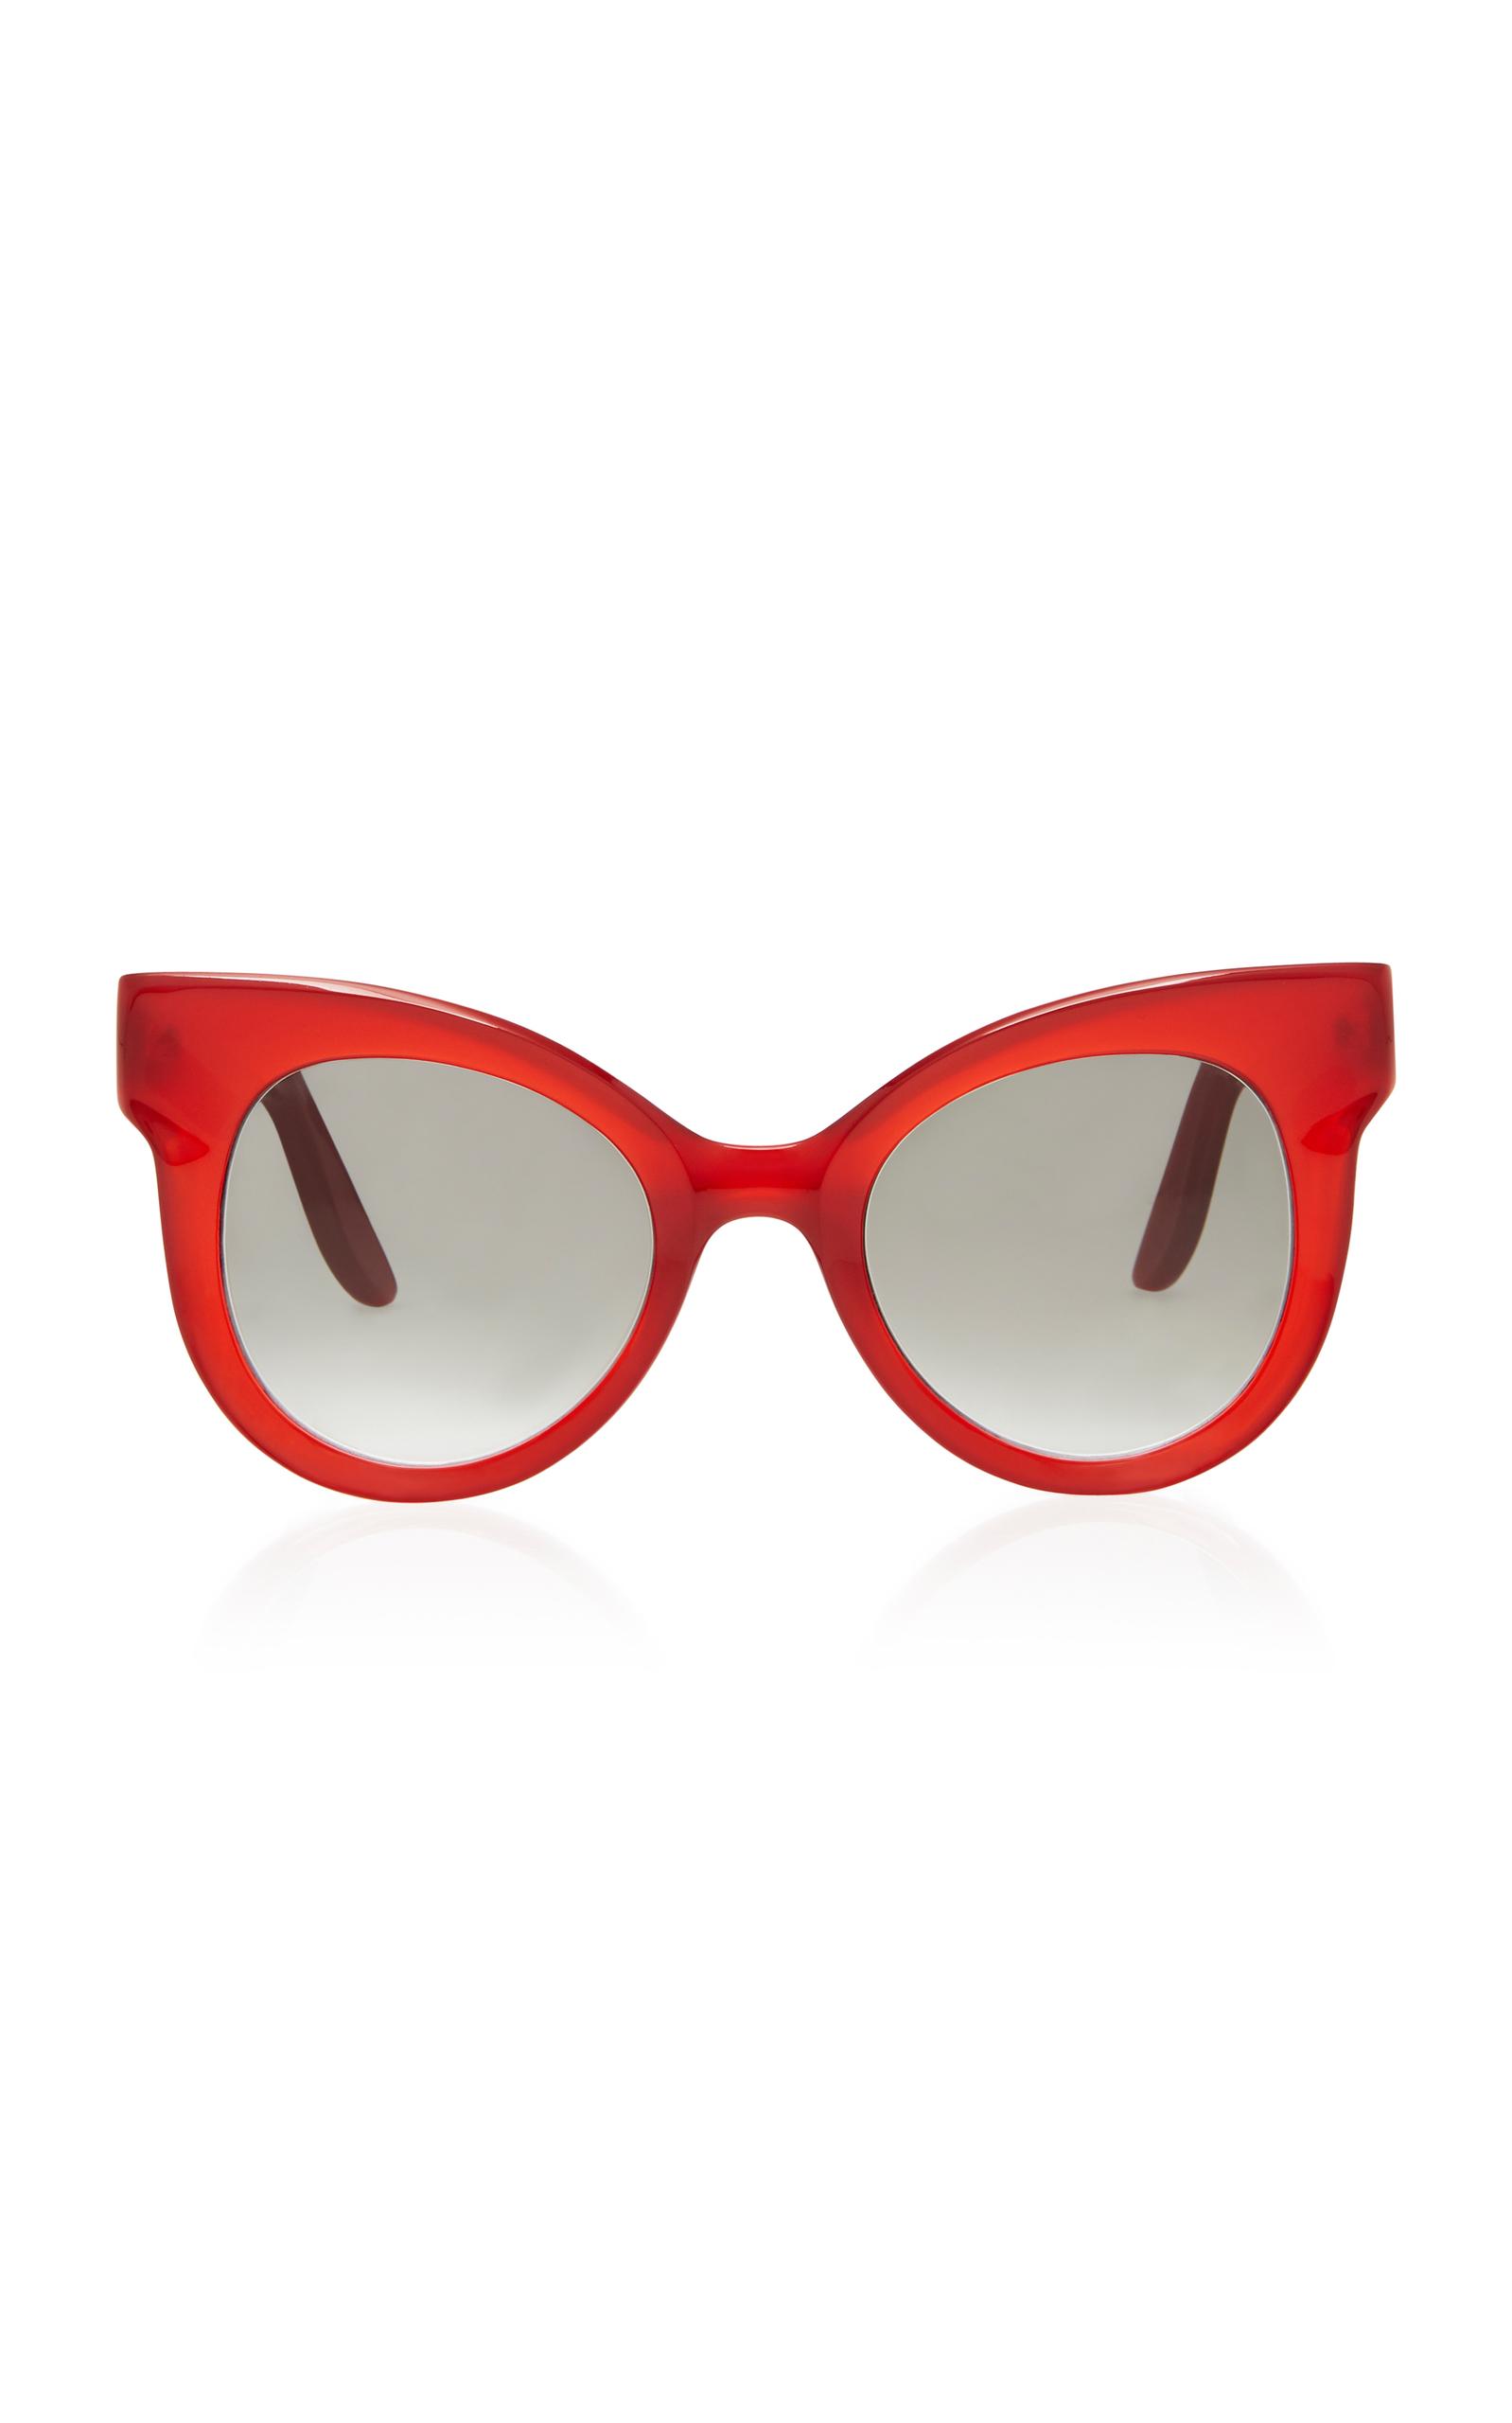 LAPIMA Ana Cat-Eye Acetate Sunglasses in Red